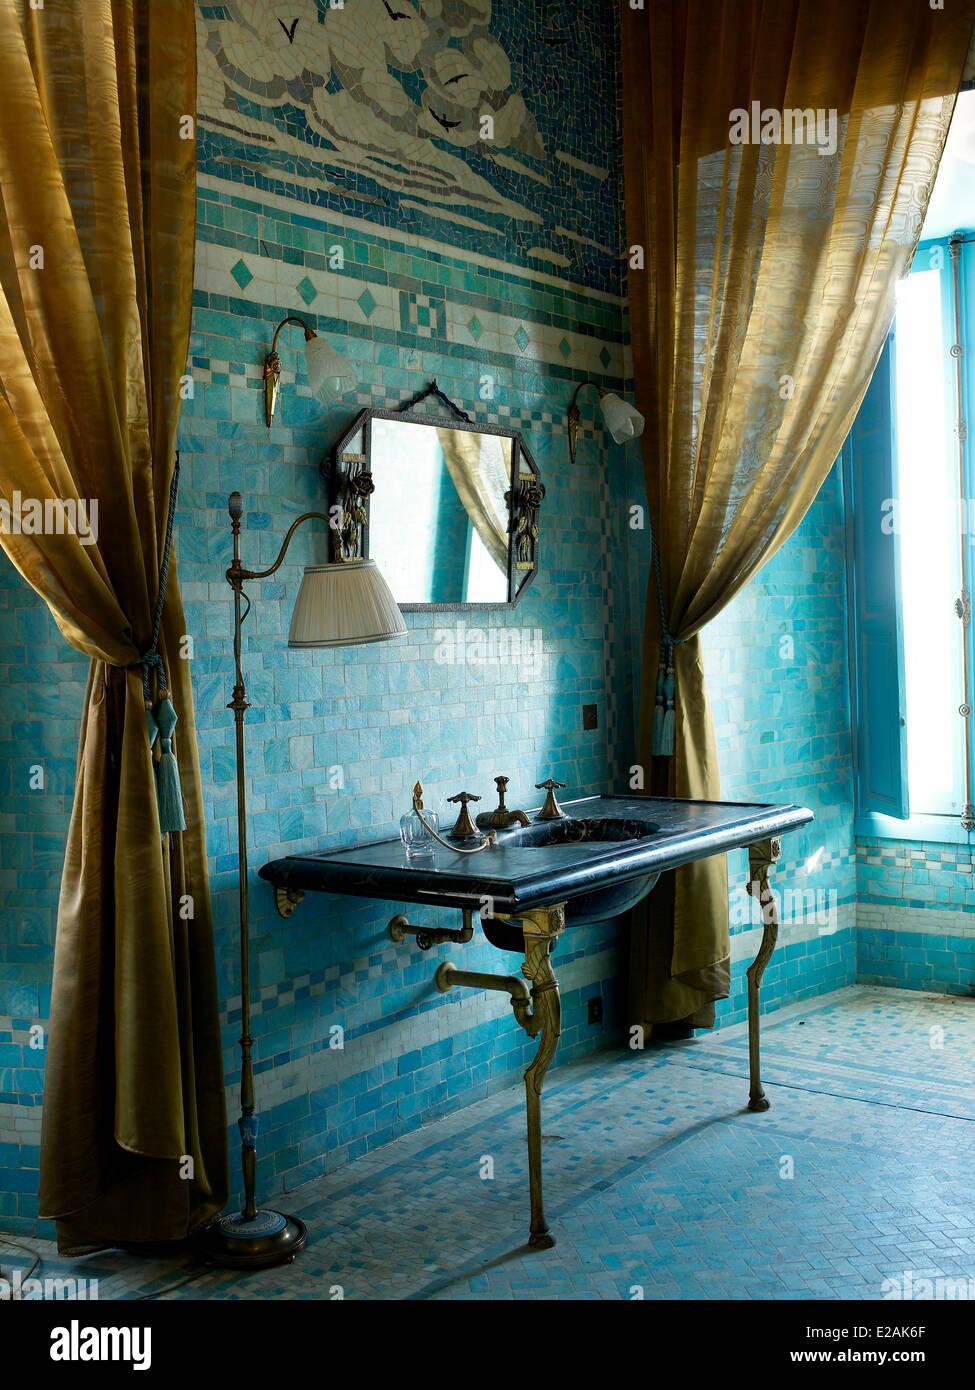 Art Deco Bathroom Stock Photos & Art Deco Bathroom Stock Images - Alamy